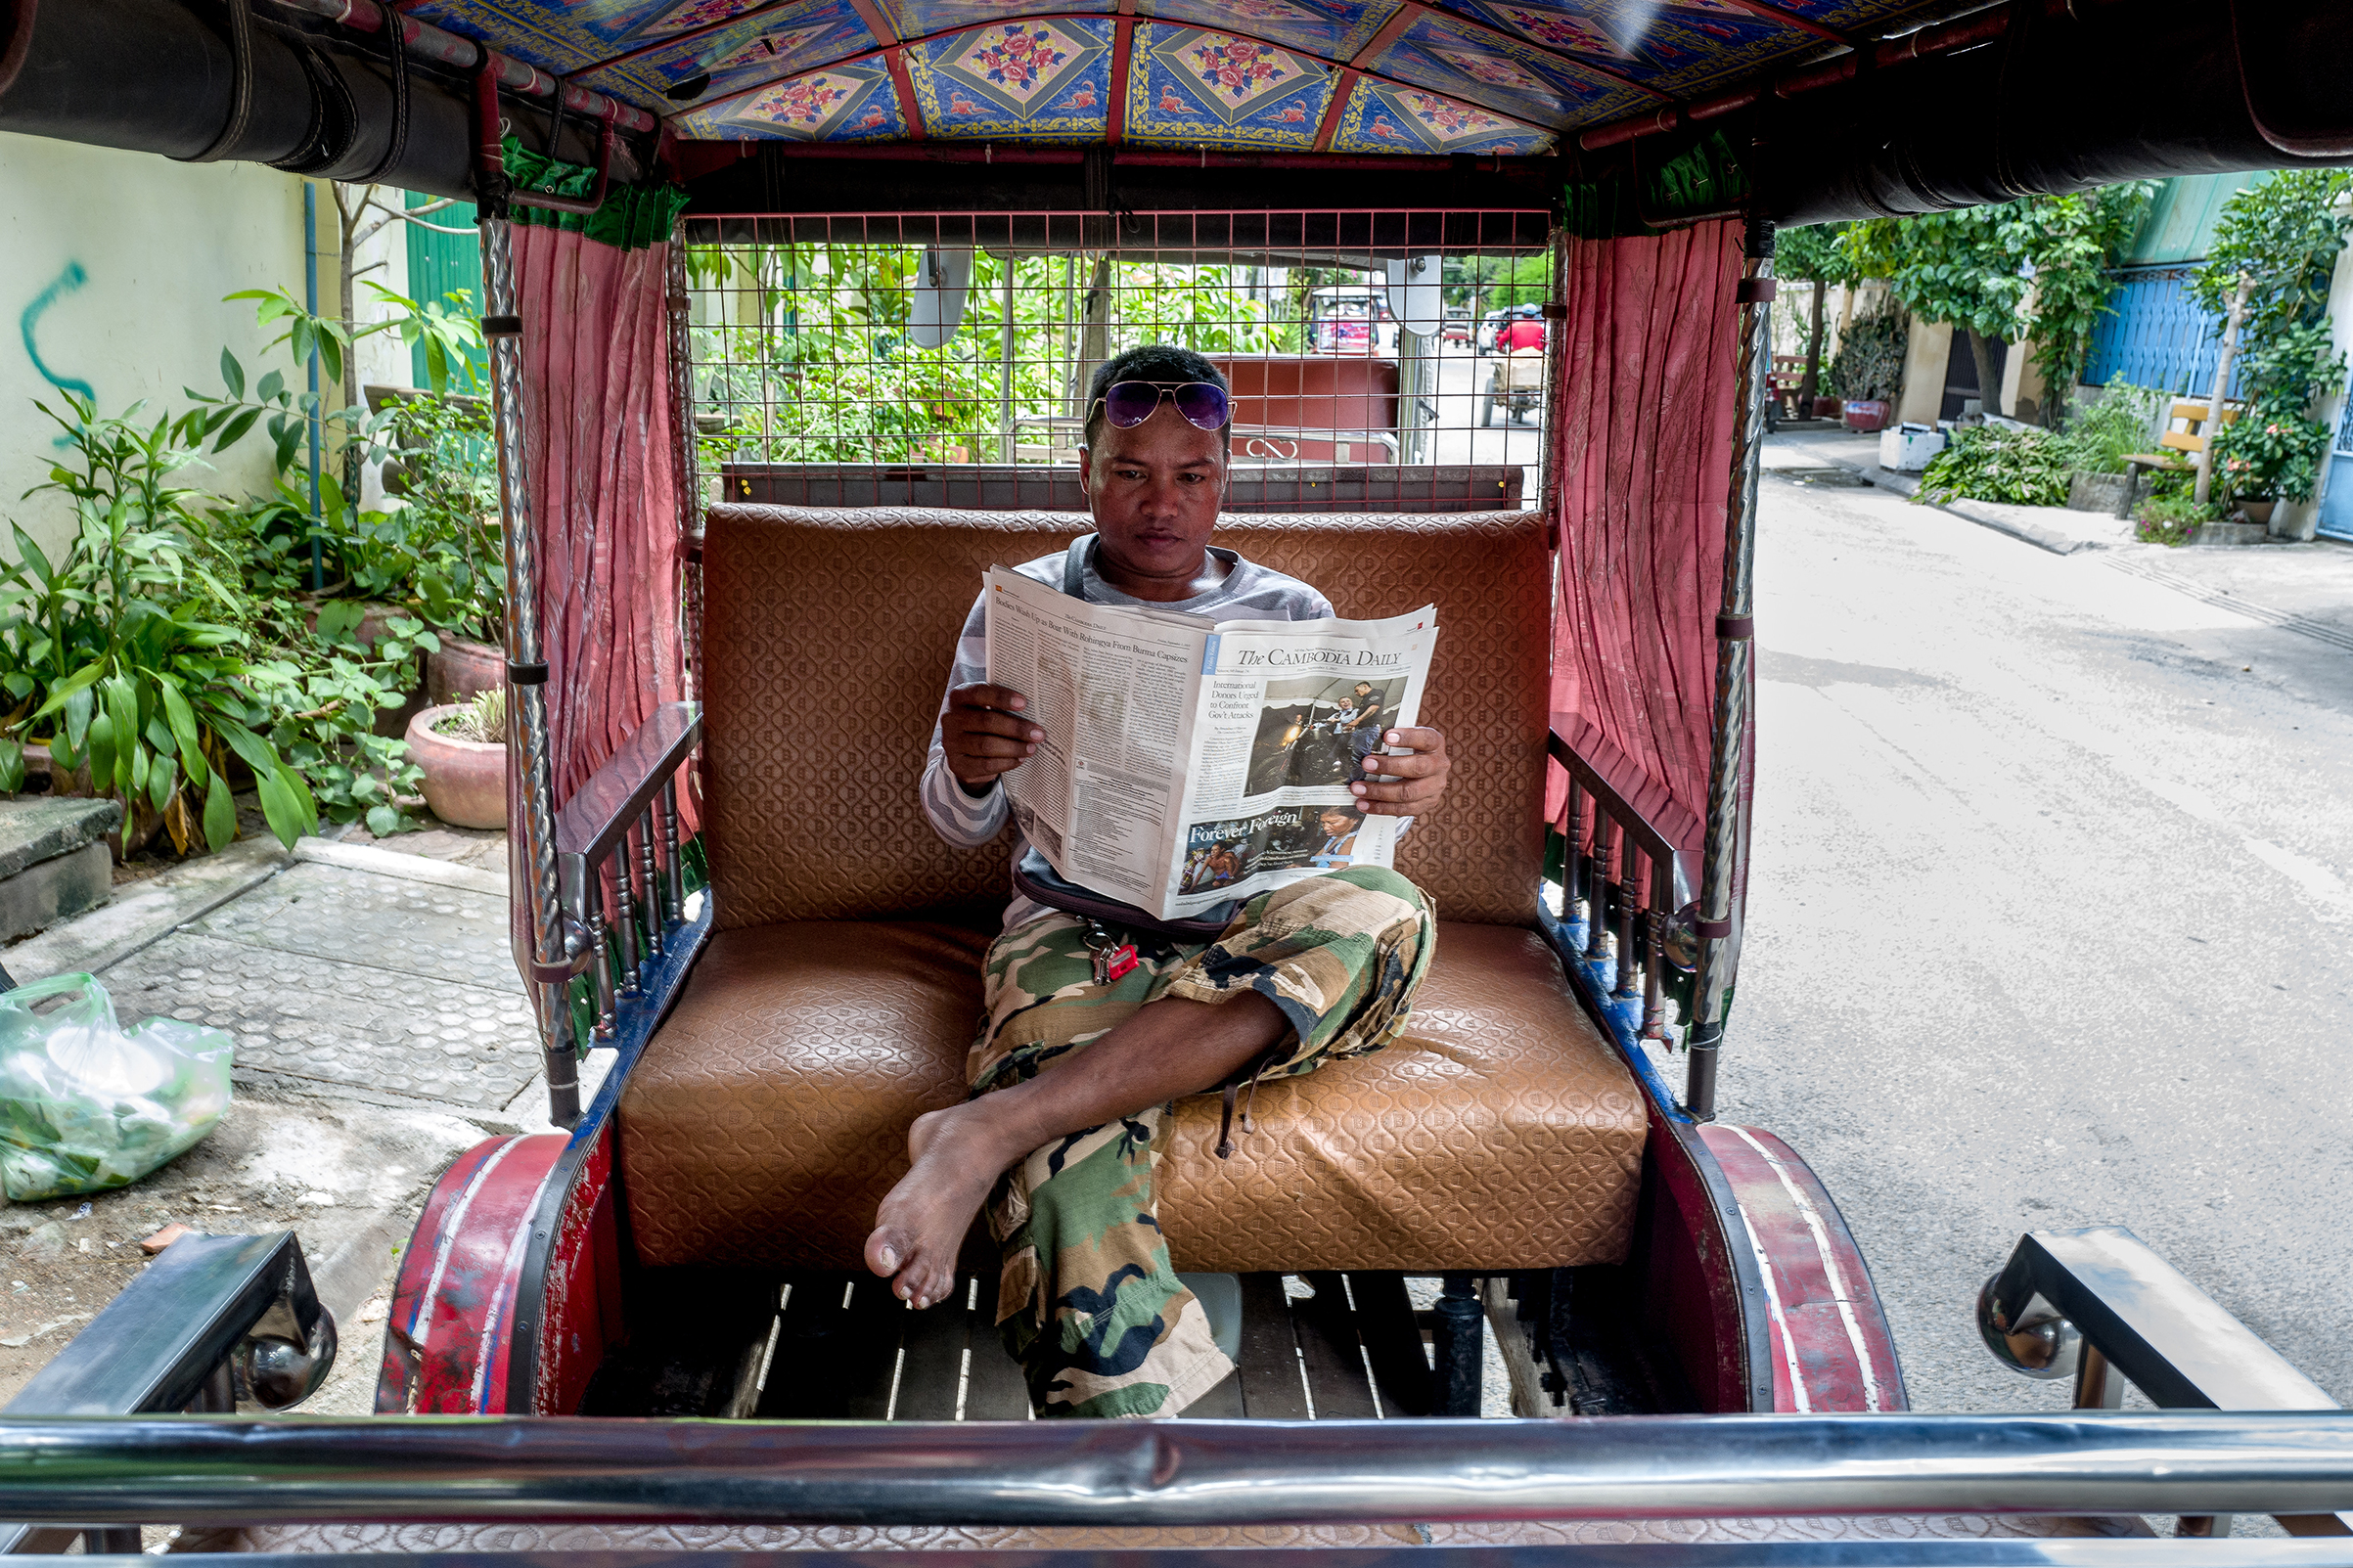 Yan Vivol, a tuk-tuk driver, reads The Cambodia Daily in Phnom Penh on Sept. 1, 2017.